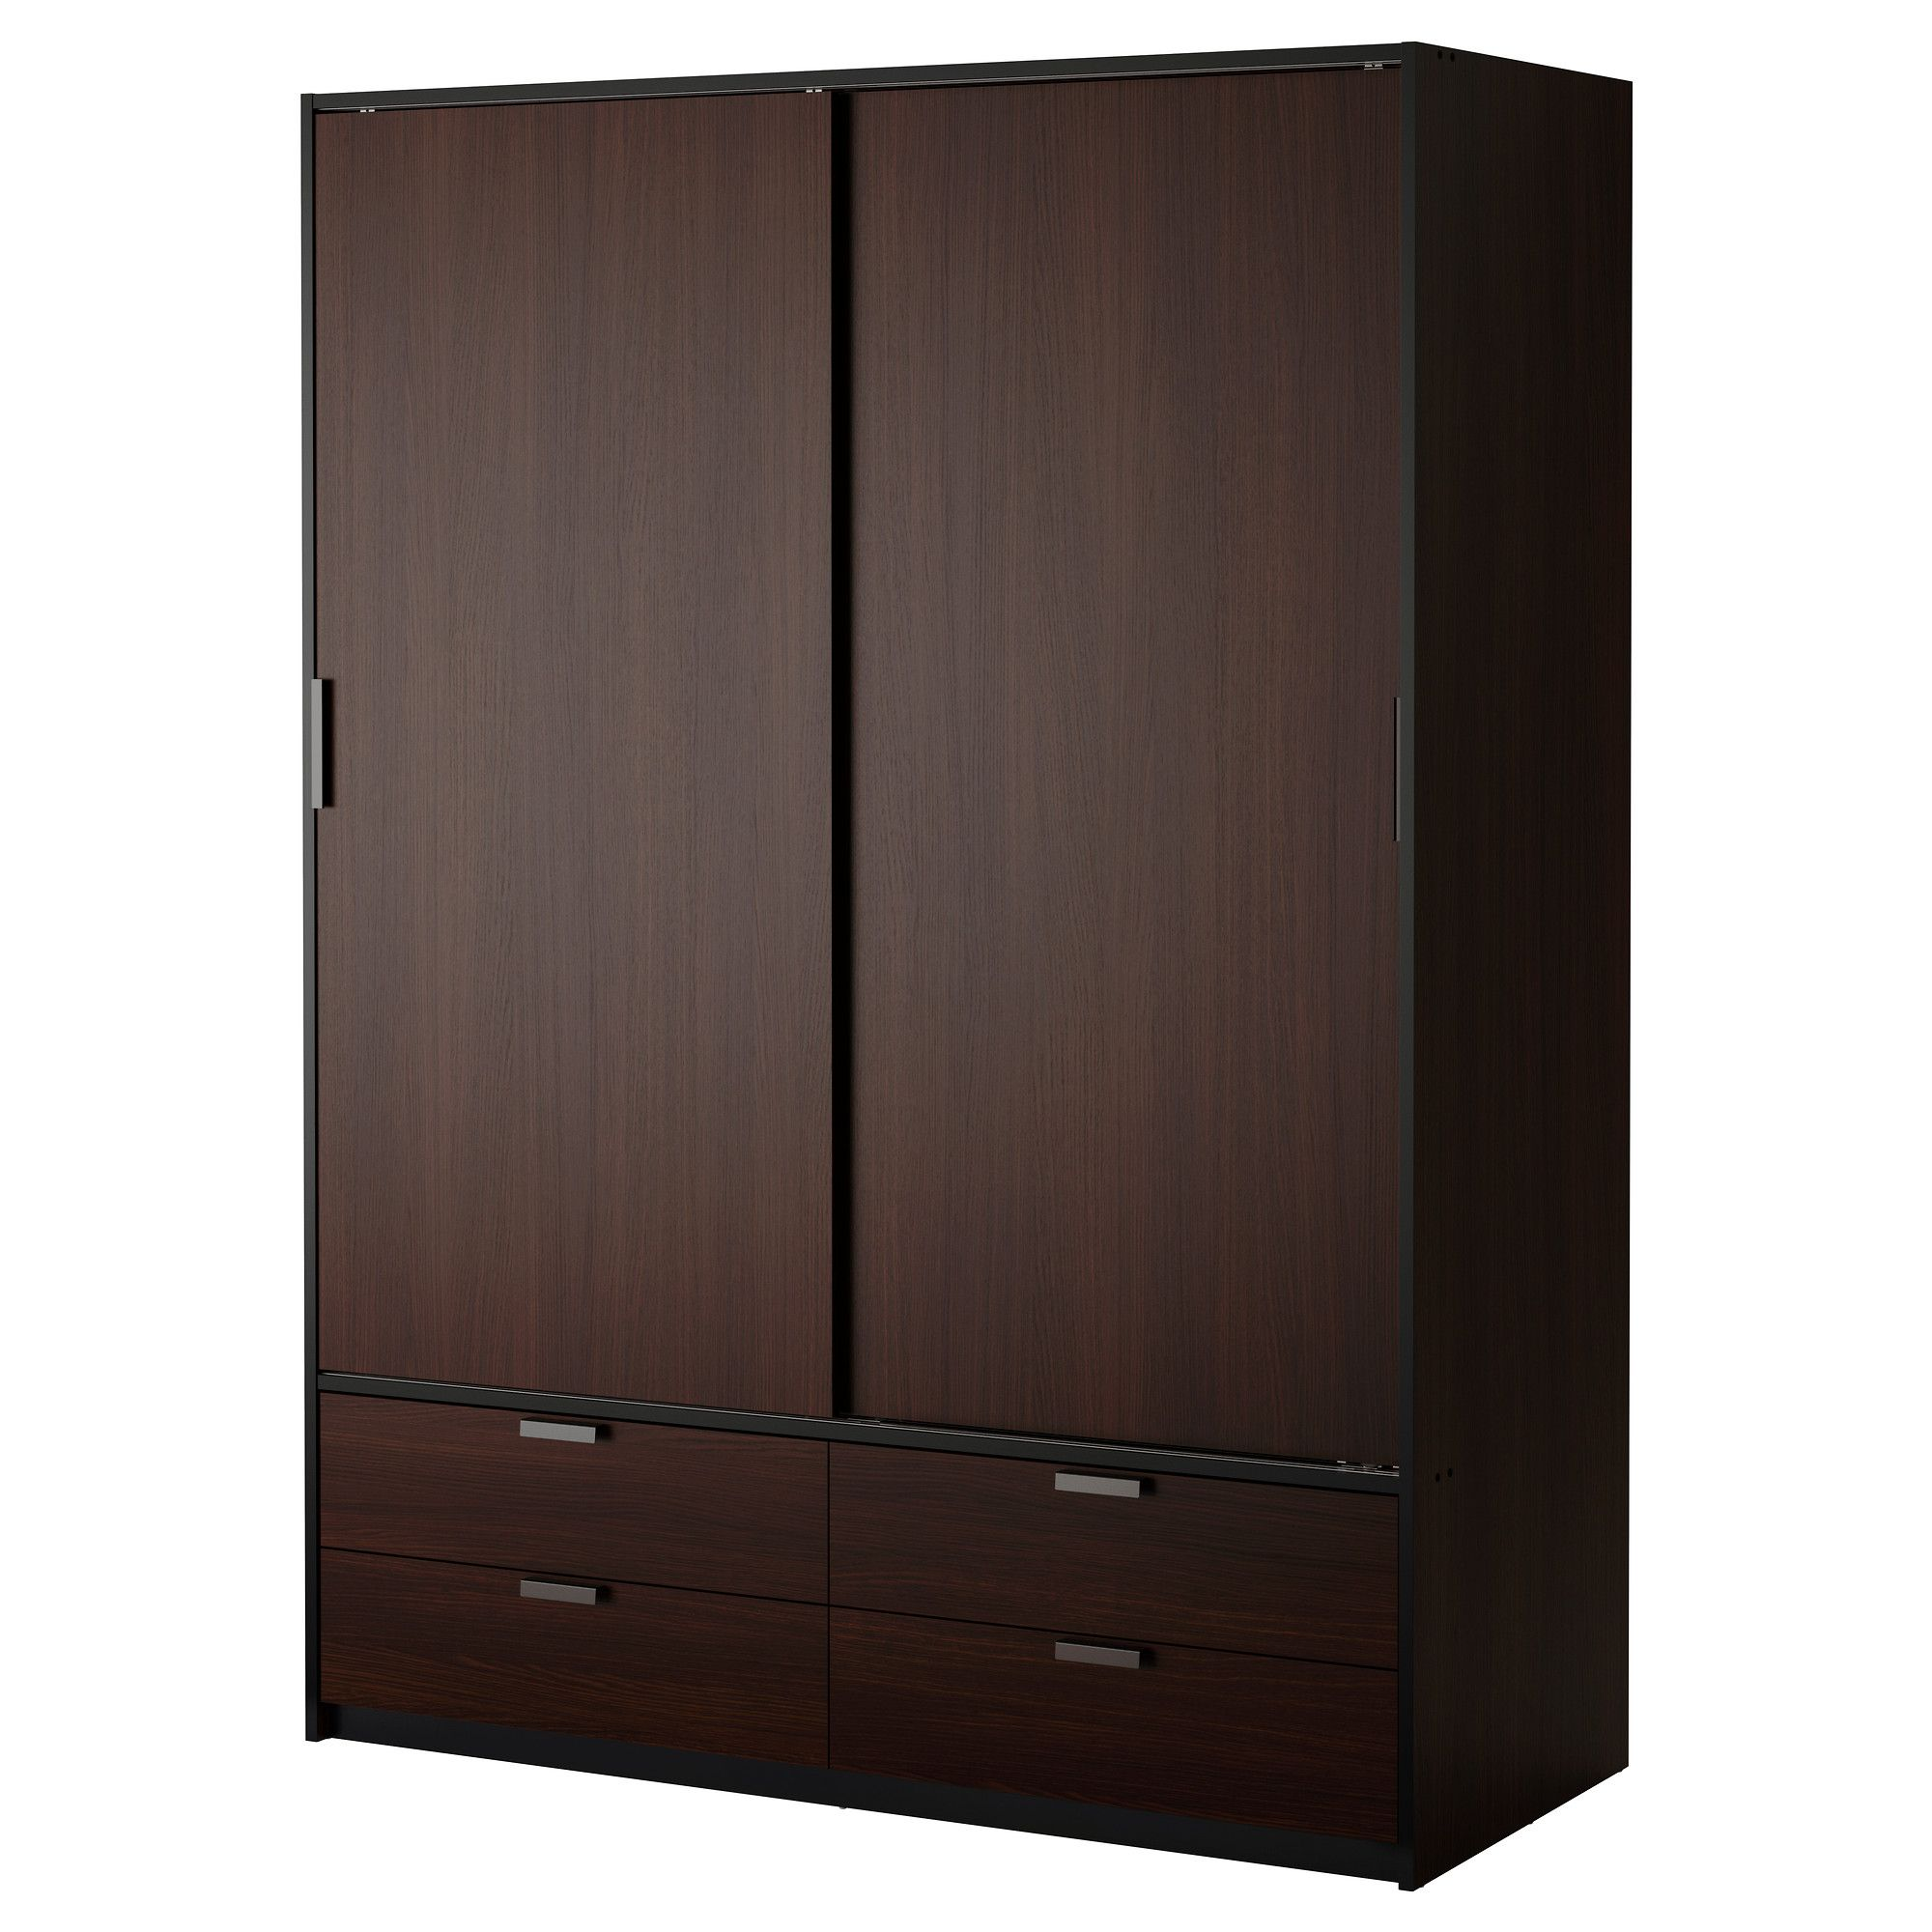 Possible Wardrobe Solution Trysil Wardrobe W Sliding Doors 4 Drawers Dark Brown Black Ikea